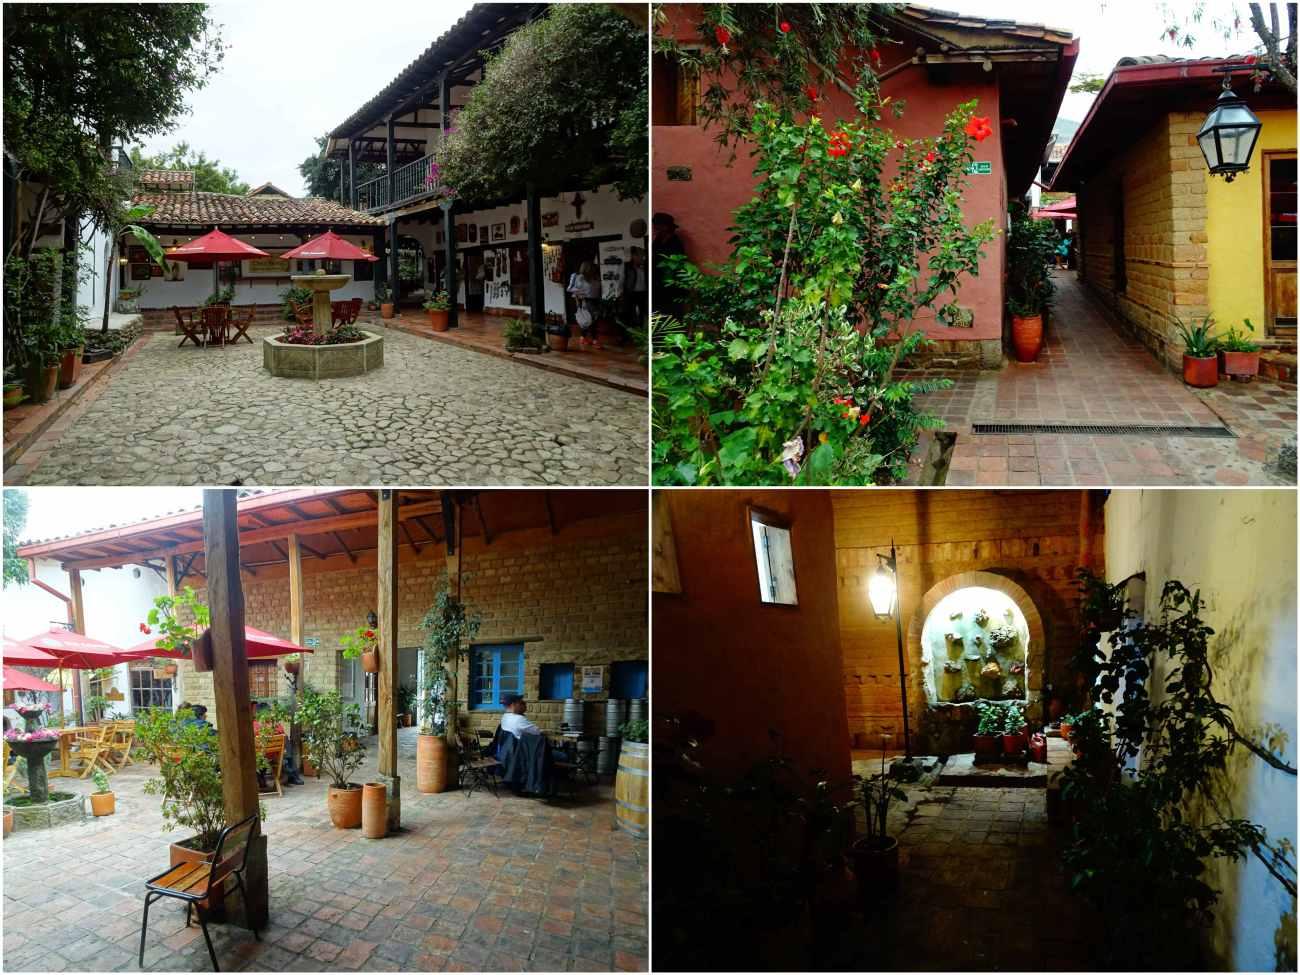 Casa2 villa de leyva